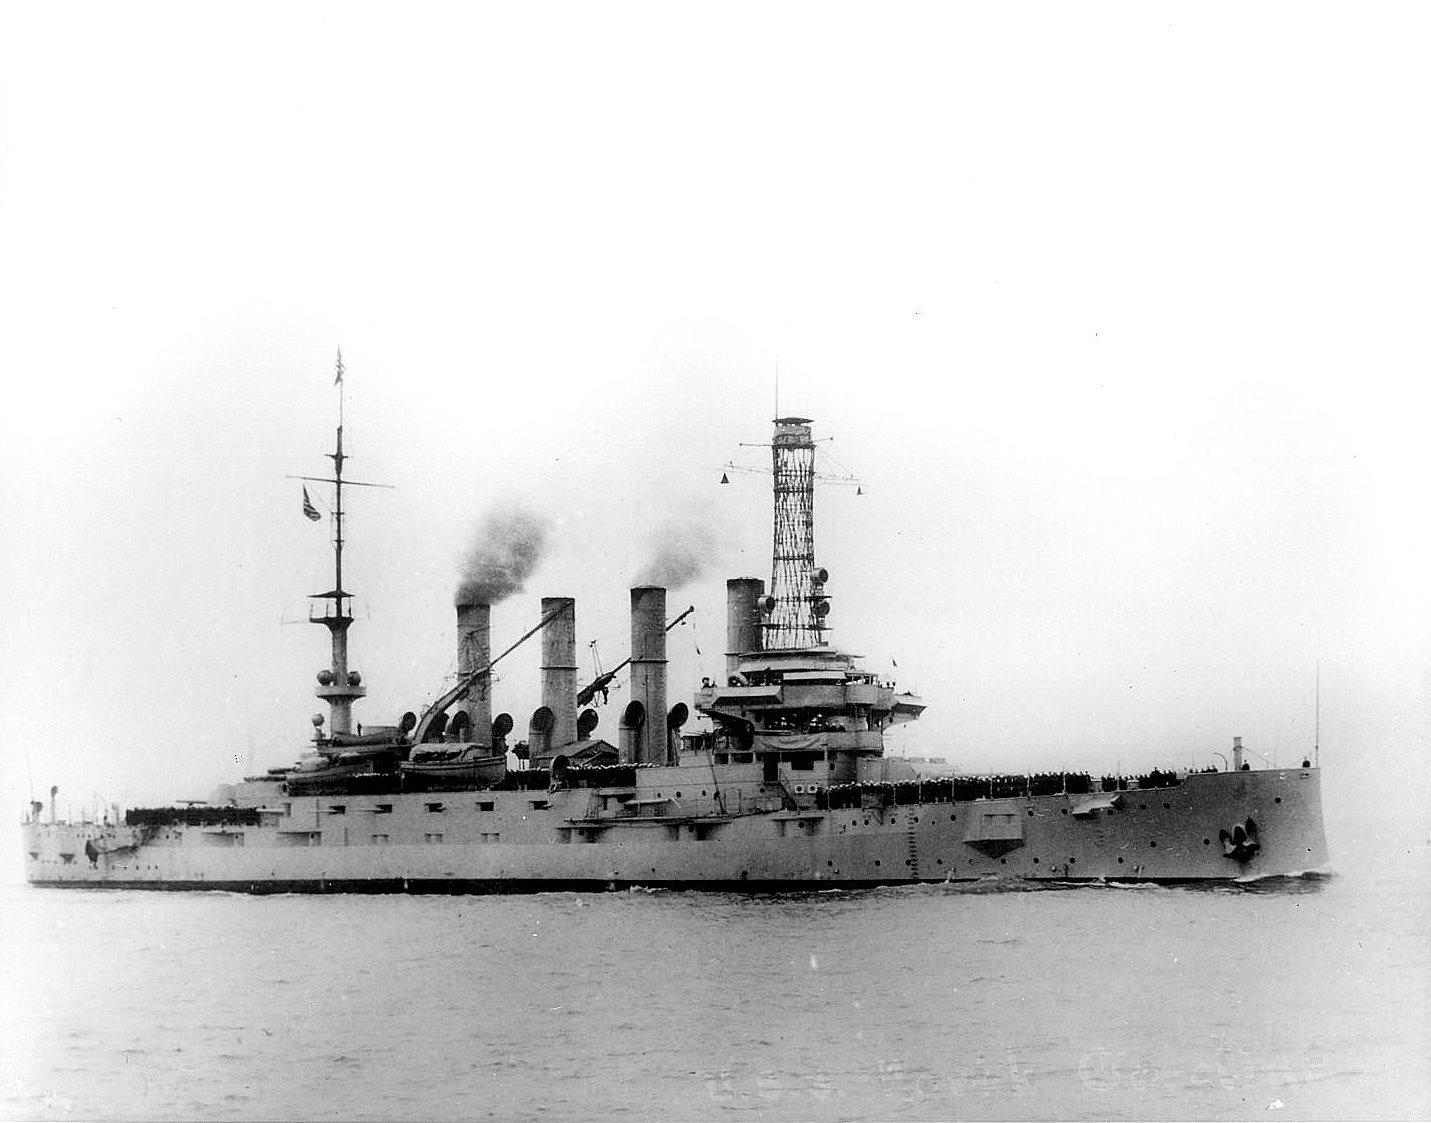 http://upload.wikimedia.org/wikipedia/commons/f/f1/USSNorthCarolinaACR12.jpg